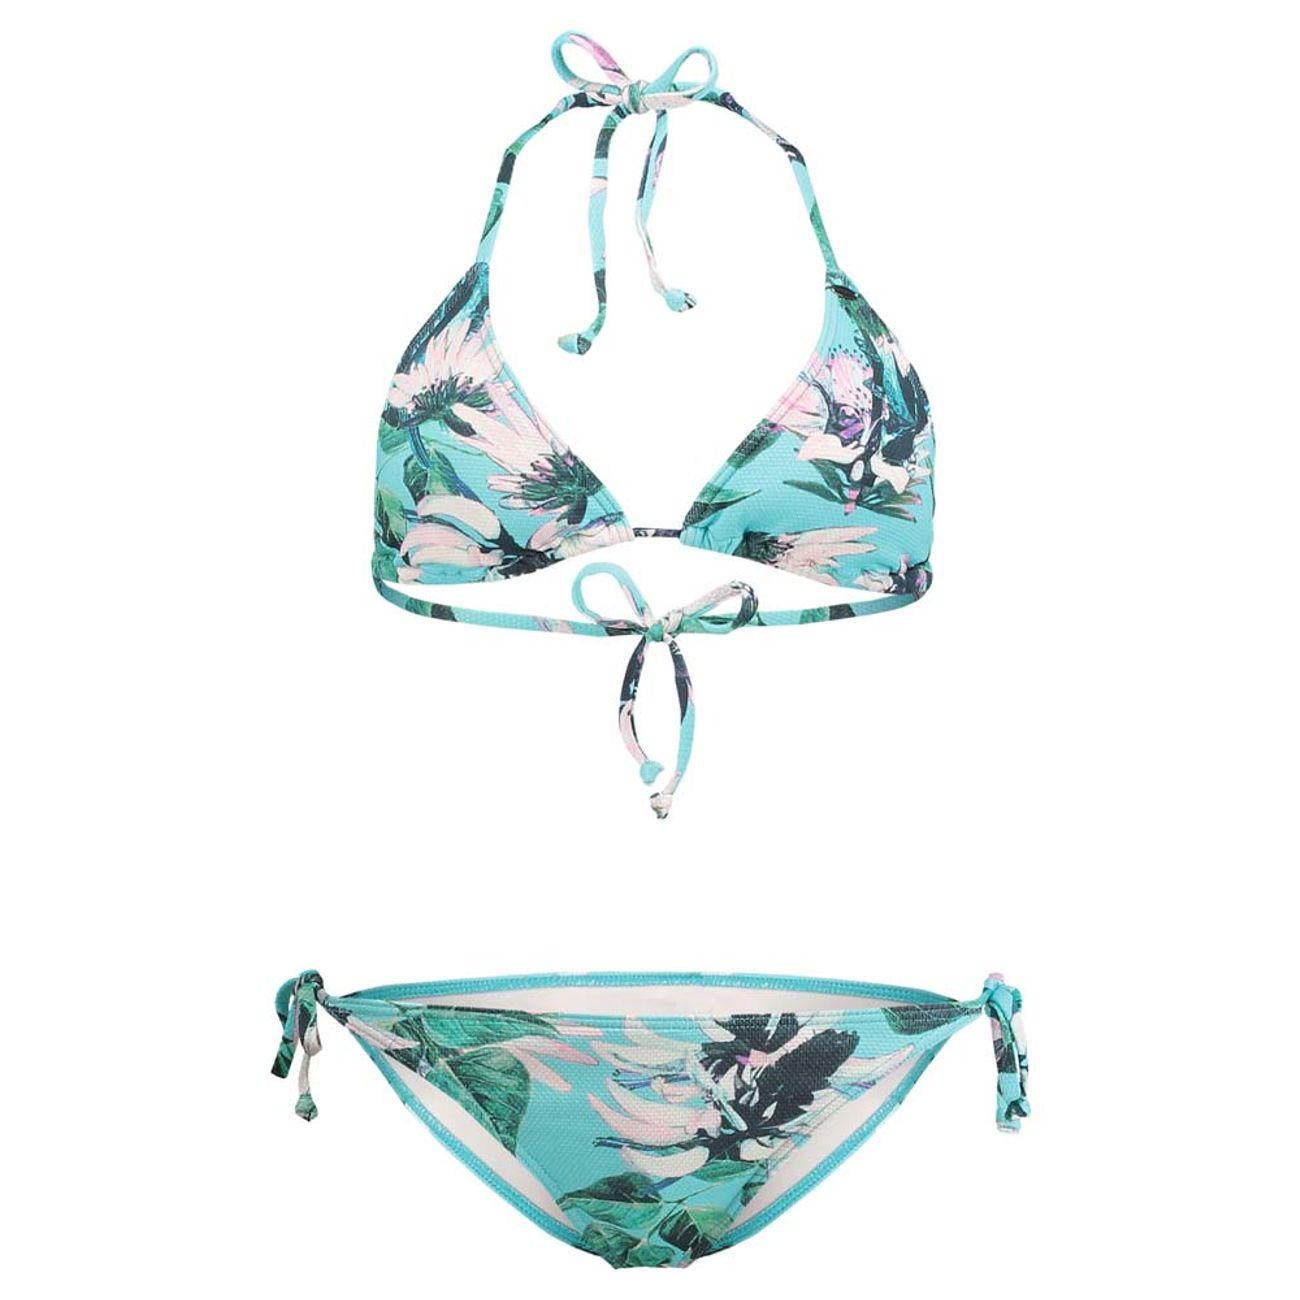 O'neill Structure Femme Triangle Bikini Oneill ModeLifestyle Kc3lTFJ1